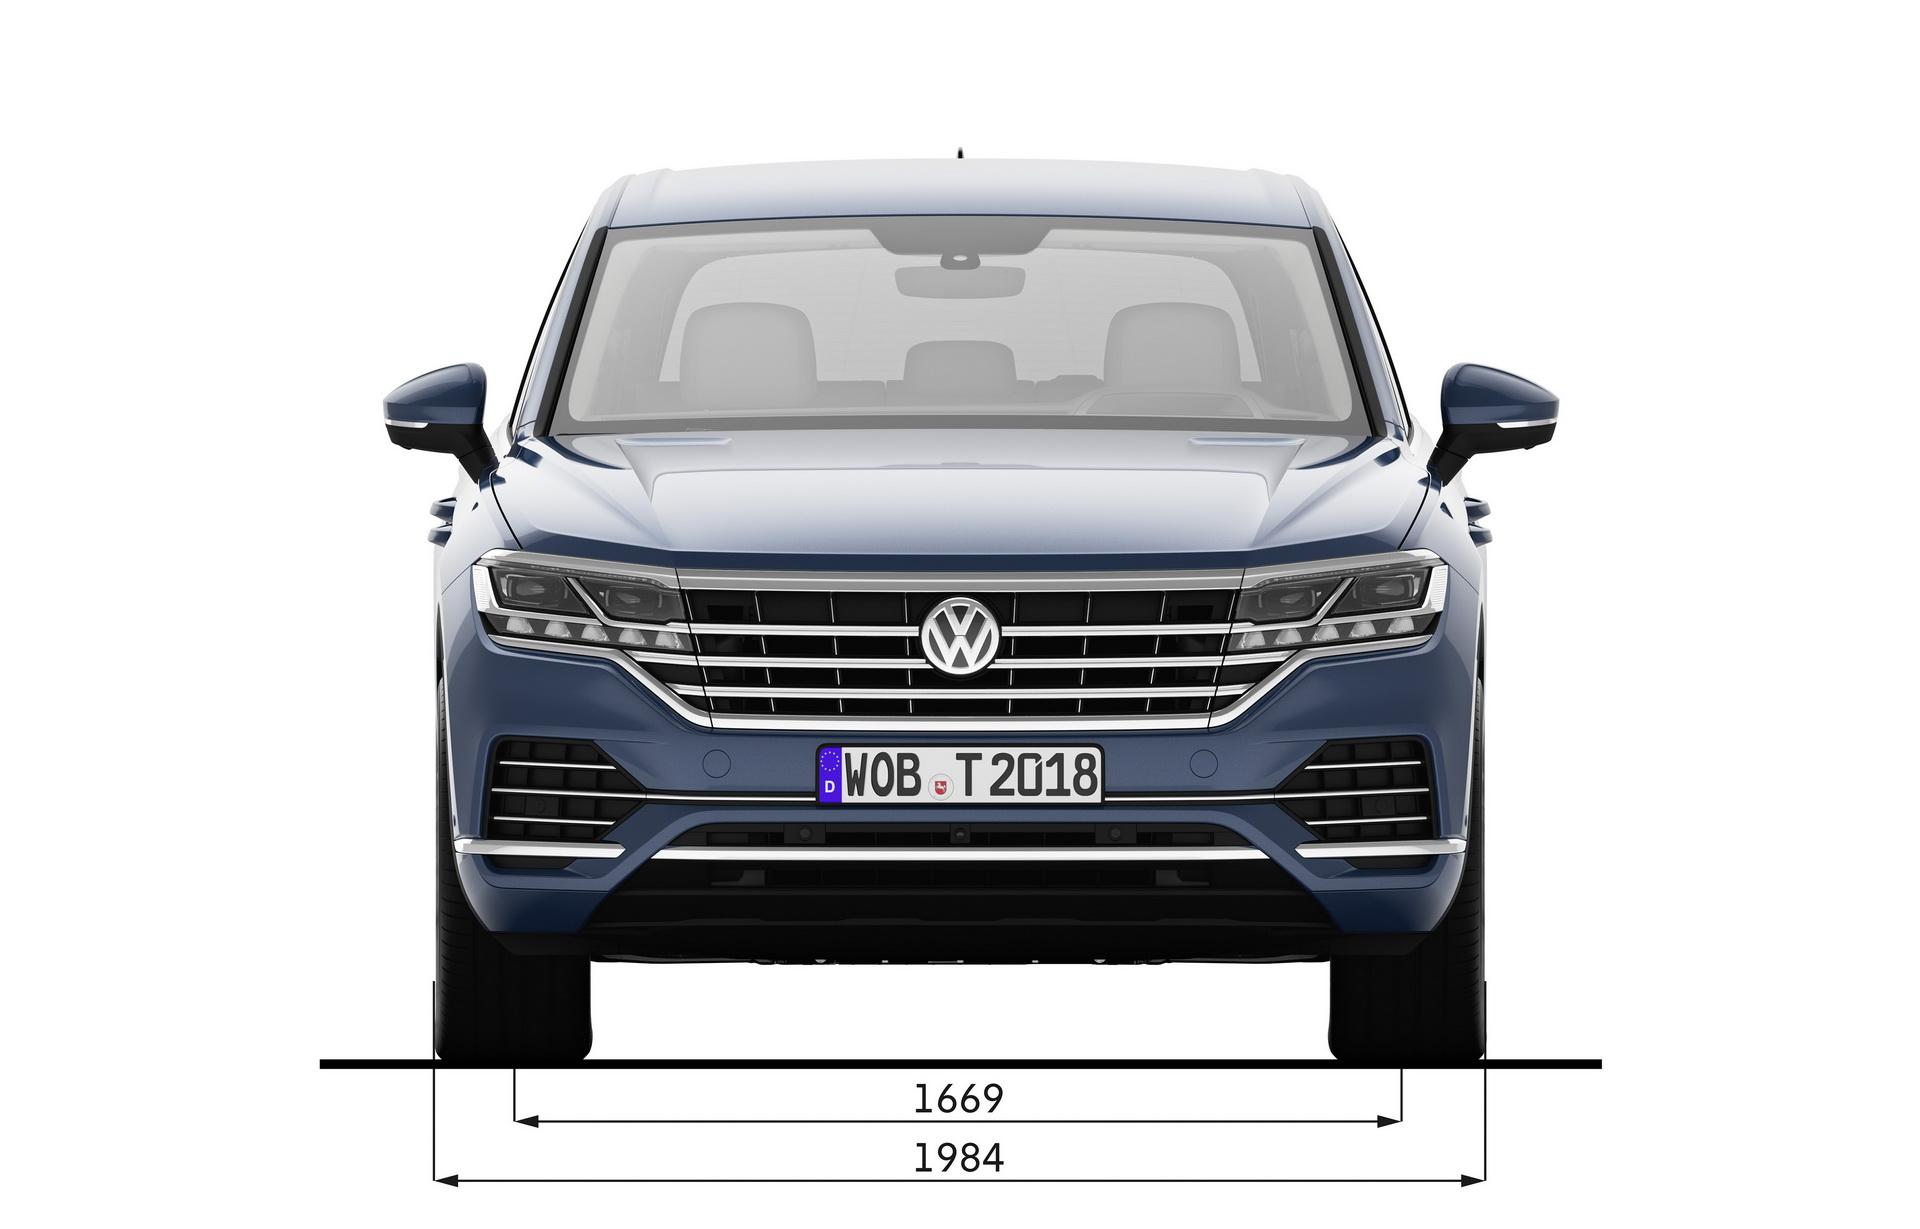 Volkswagen Touareg 2018 (39)